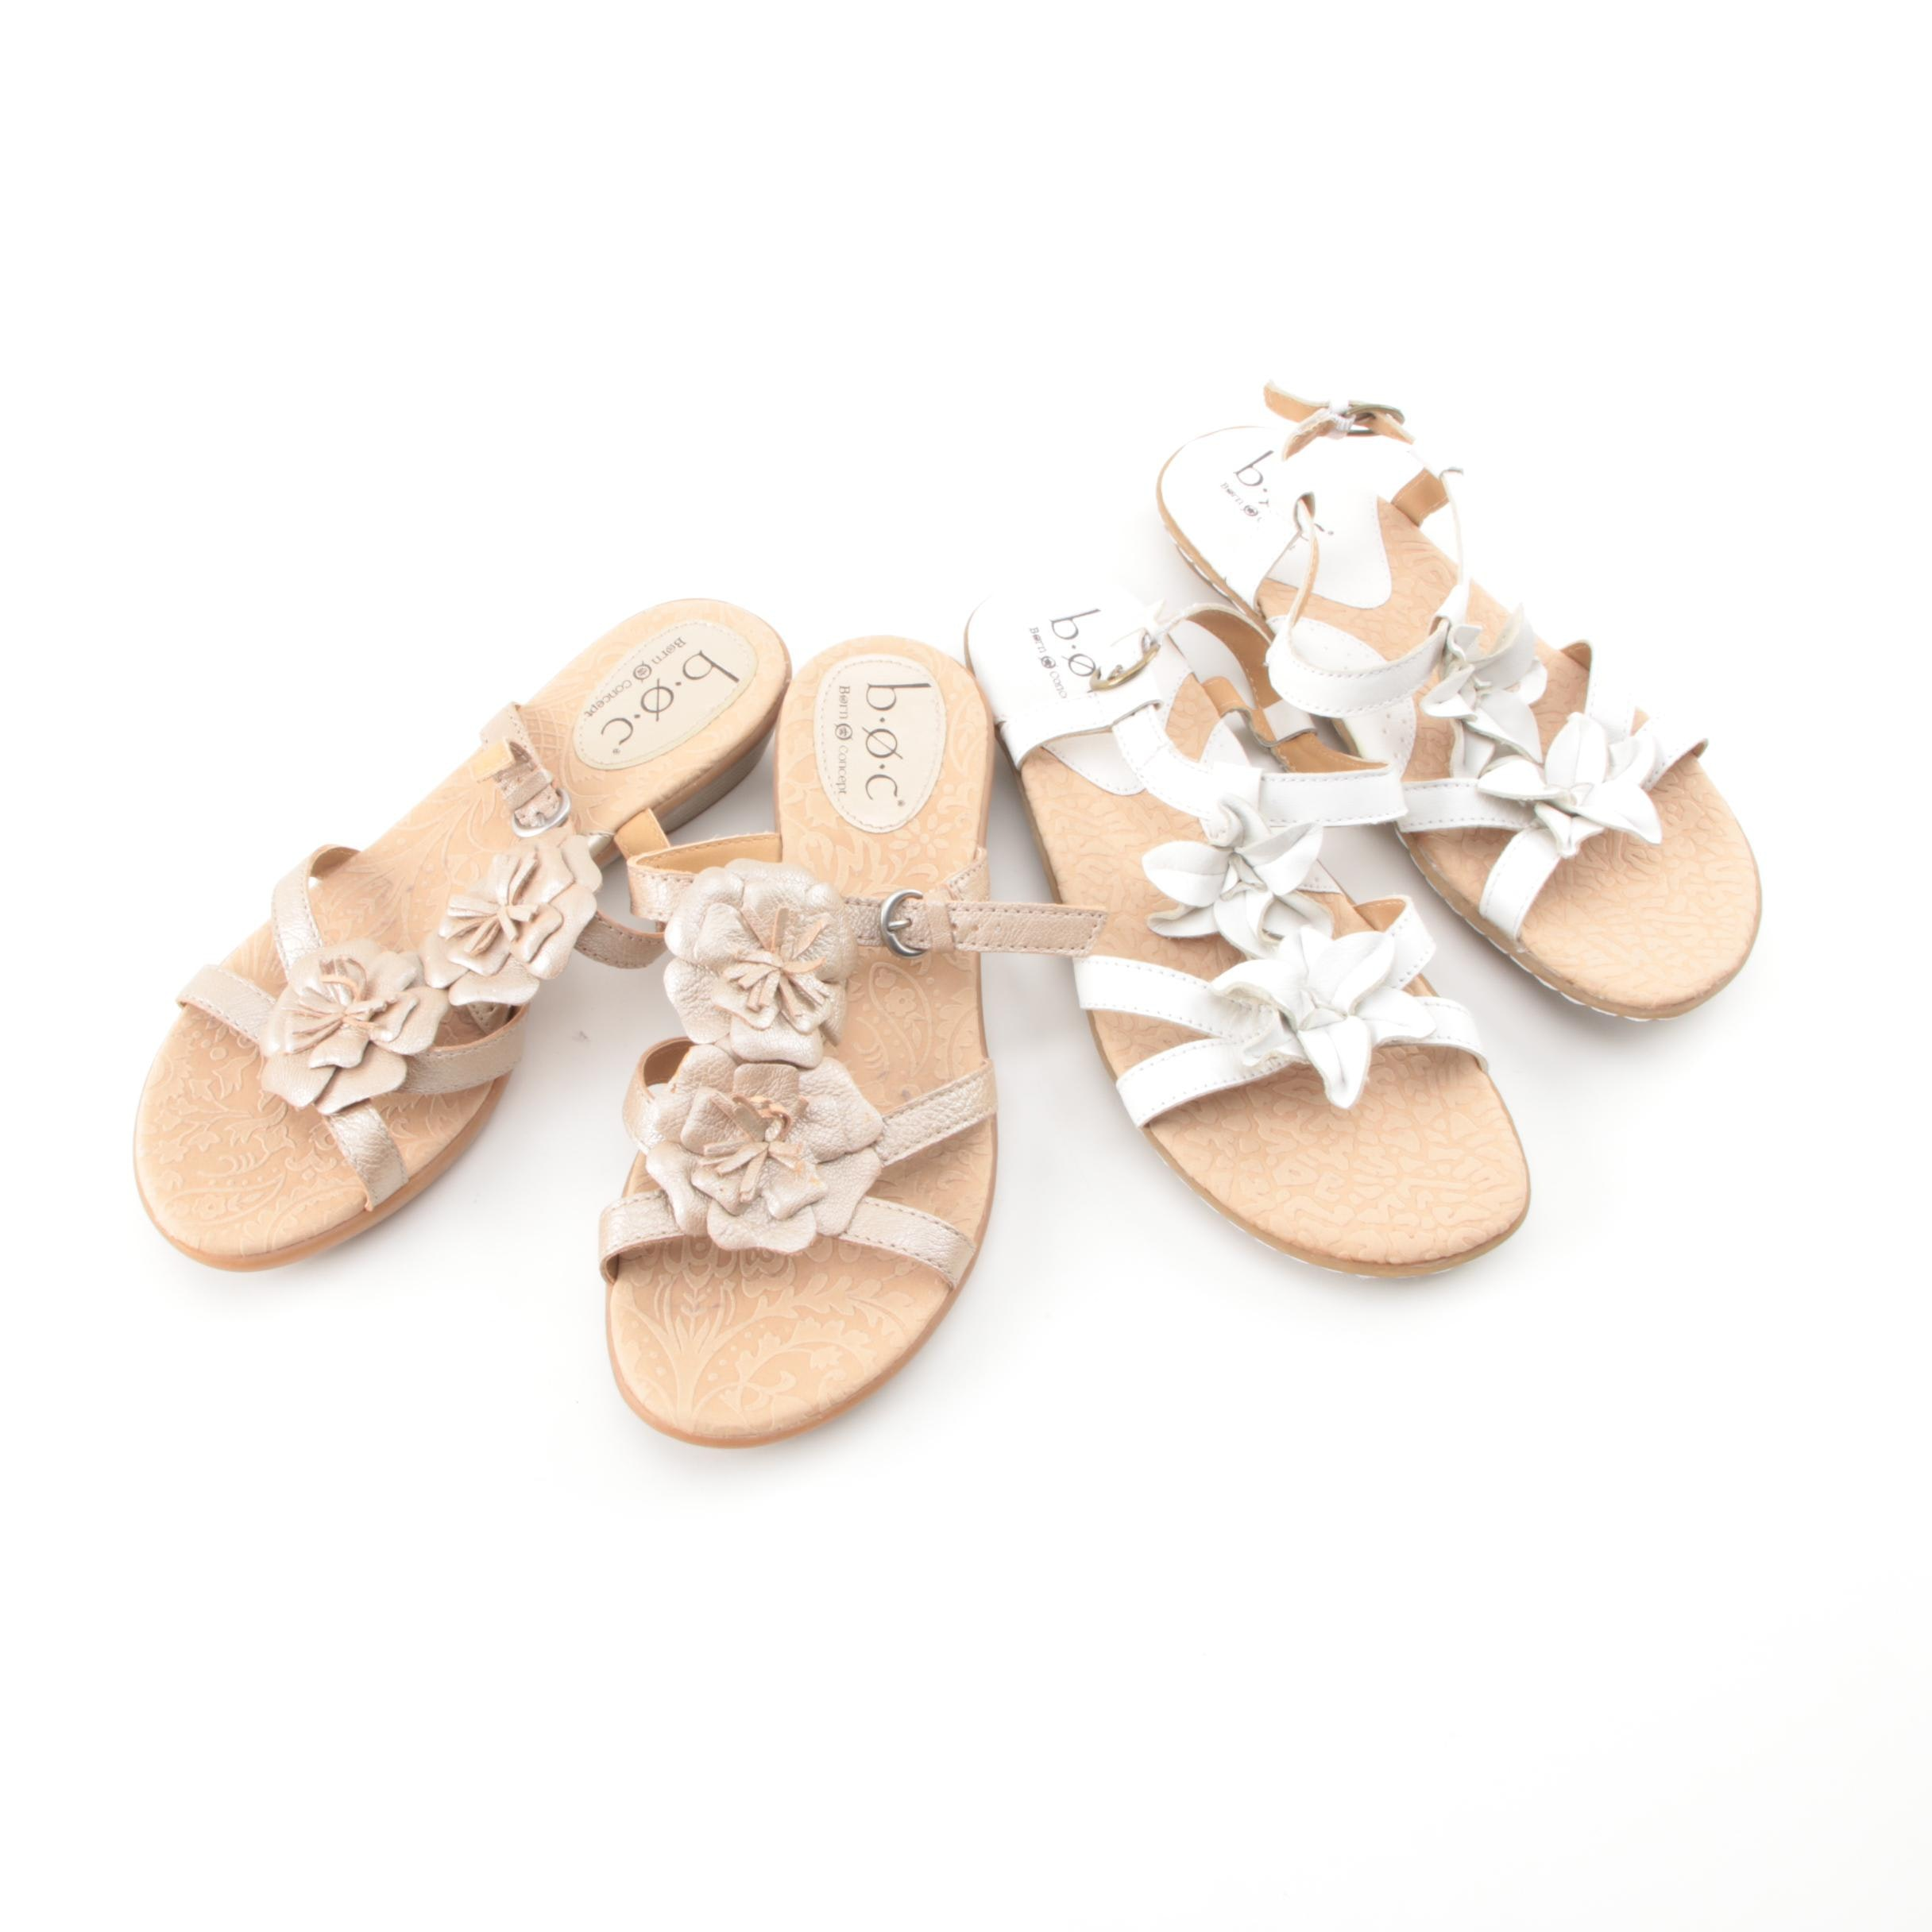 Women's B.O.C. Born Concept Leather Sandals